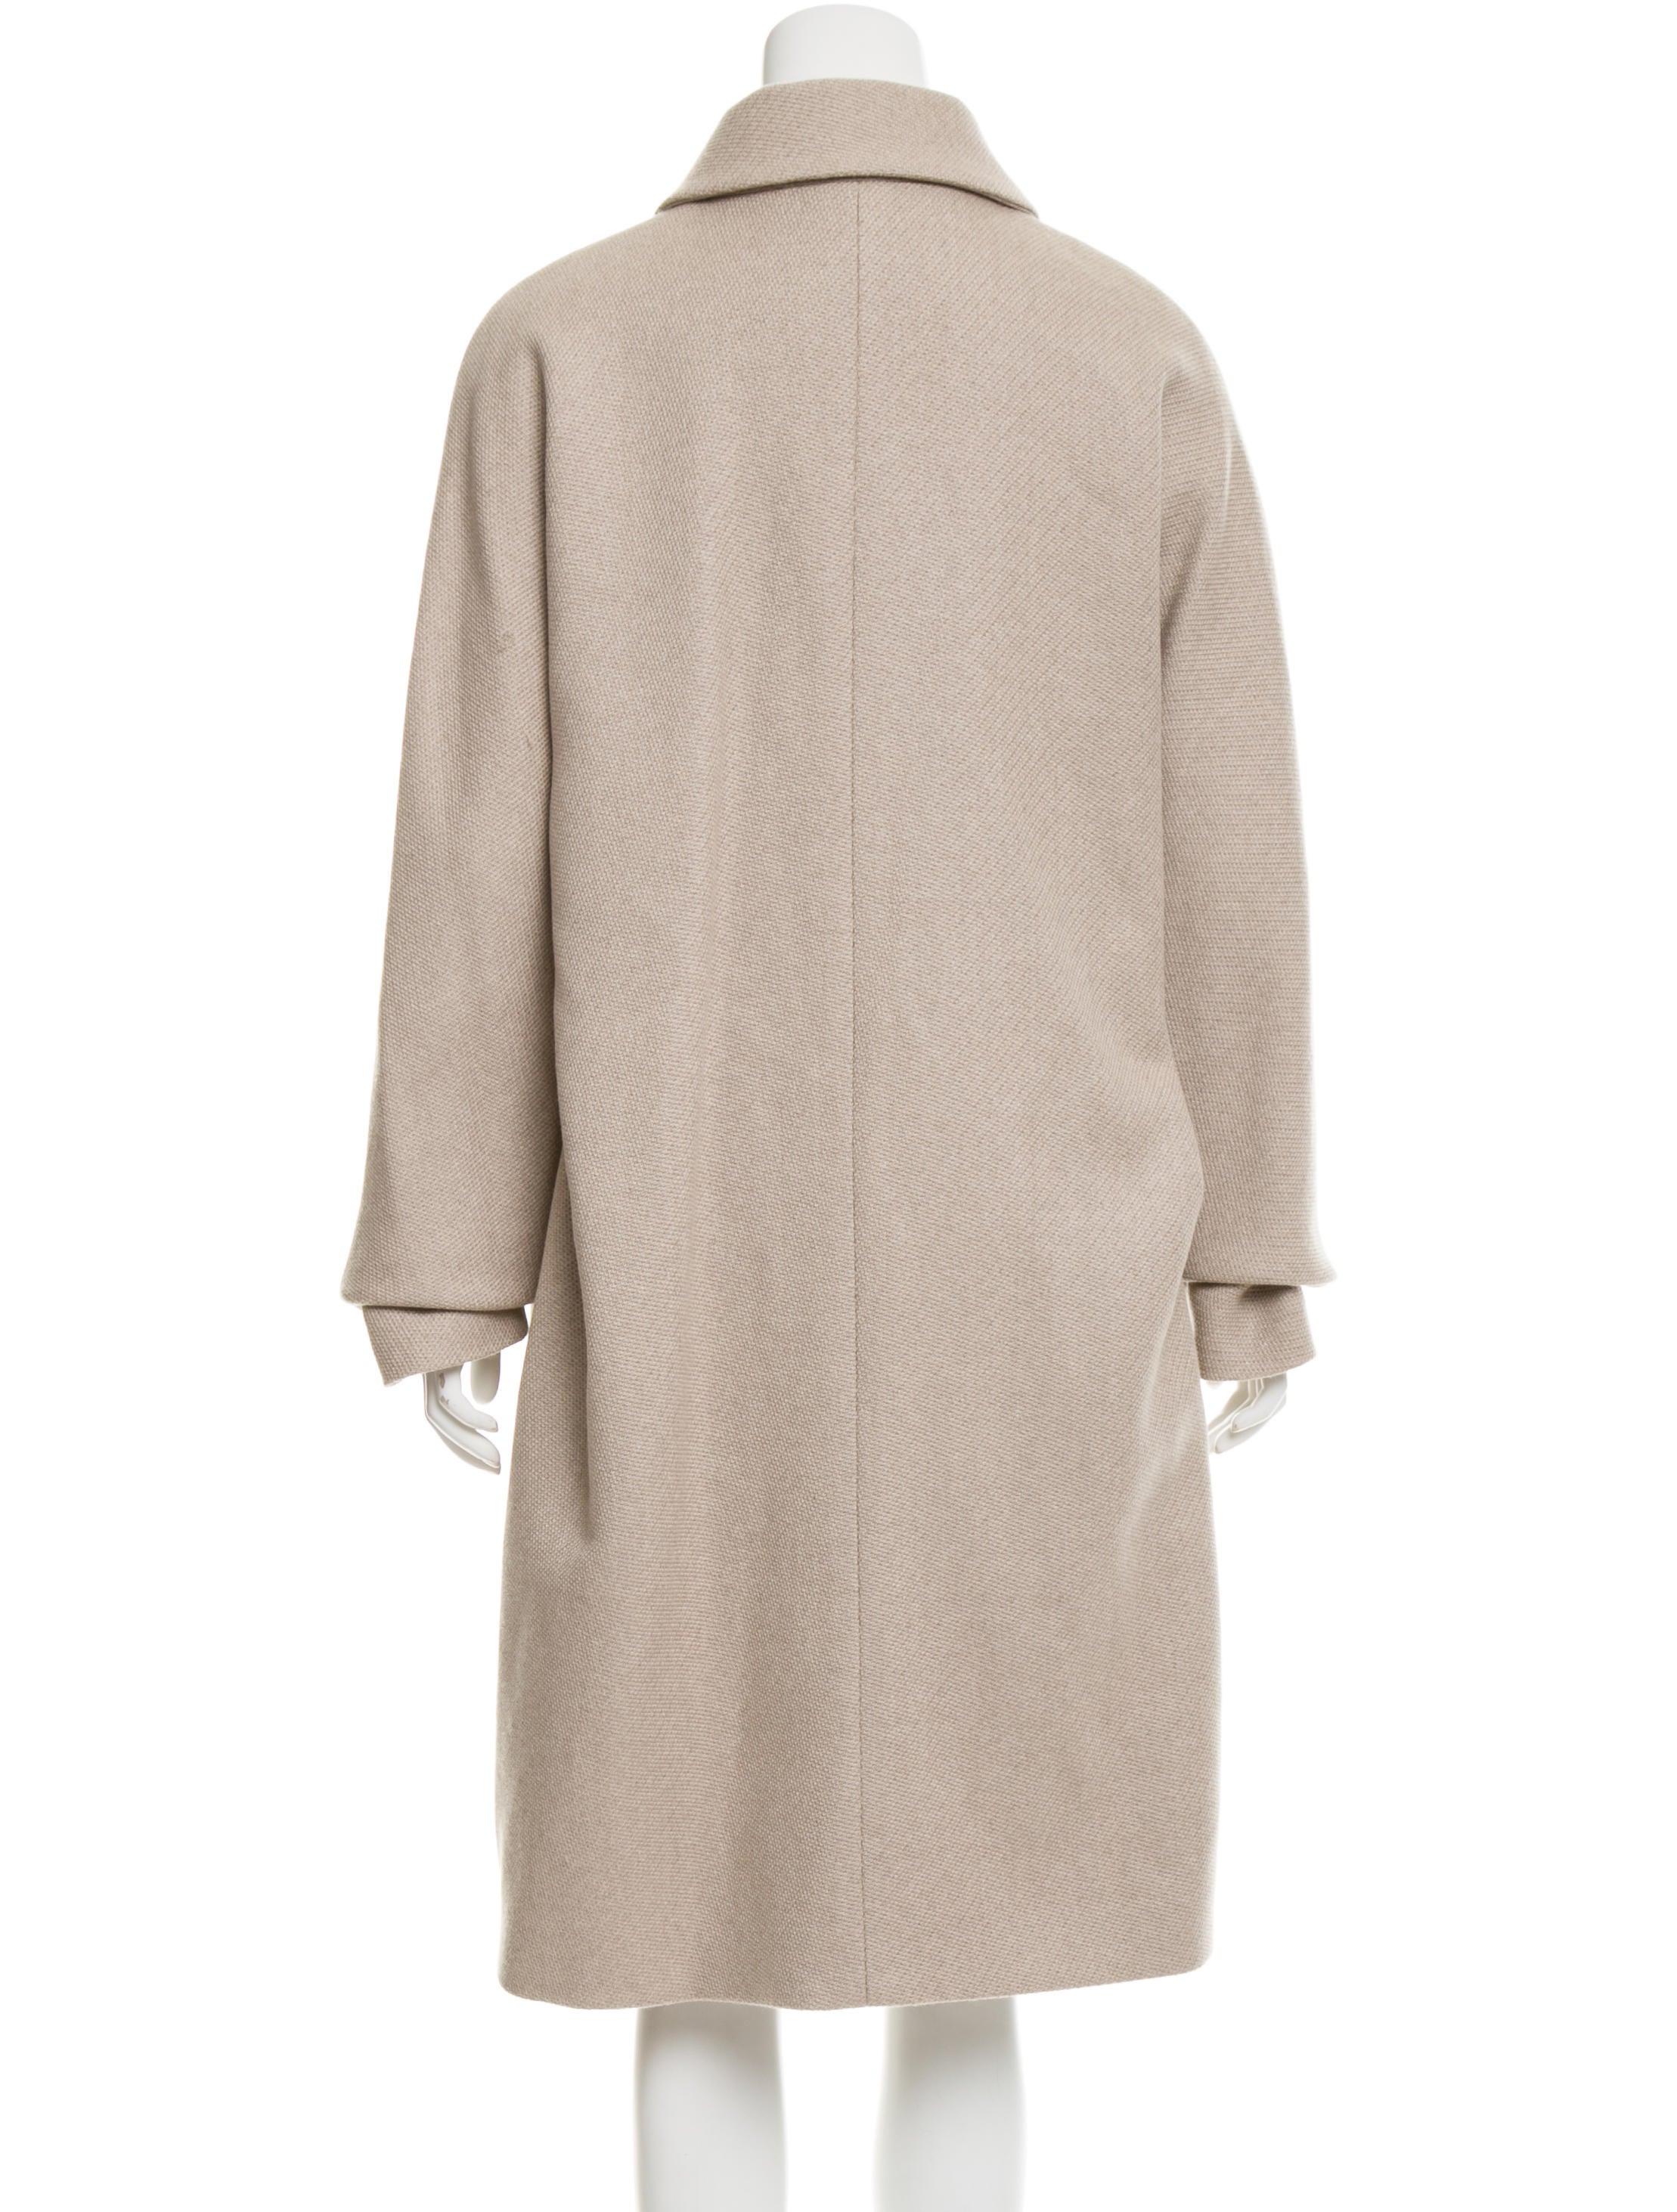 Heavy wool overcoat